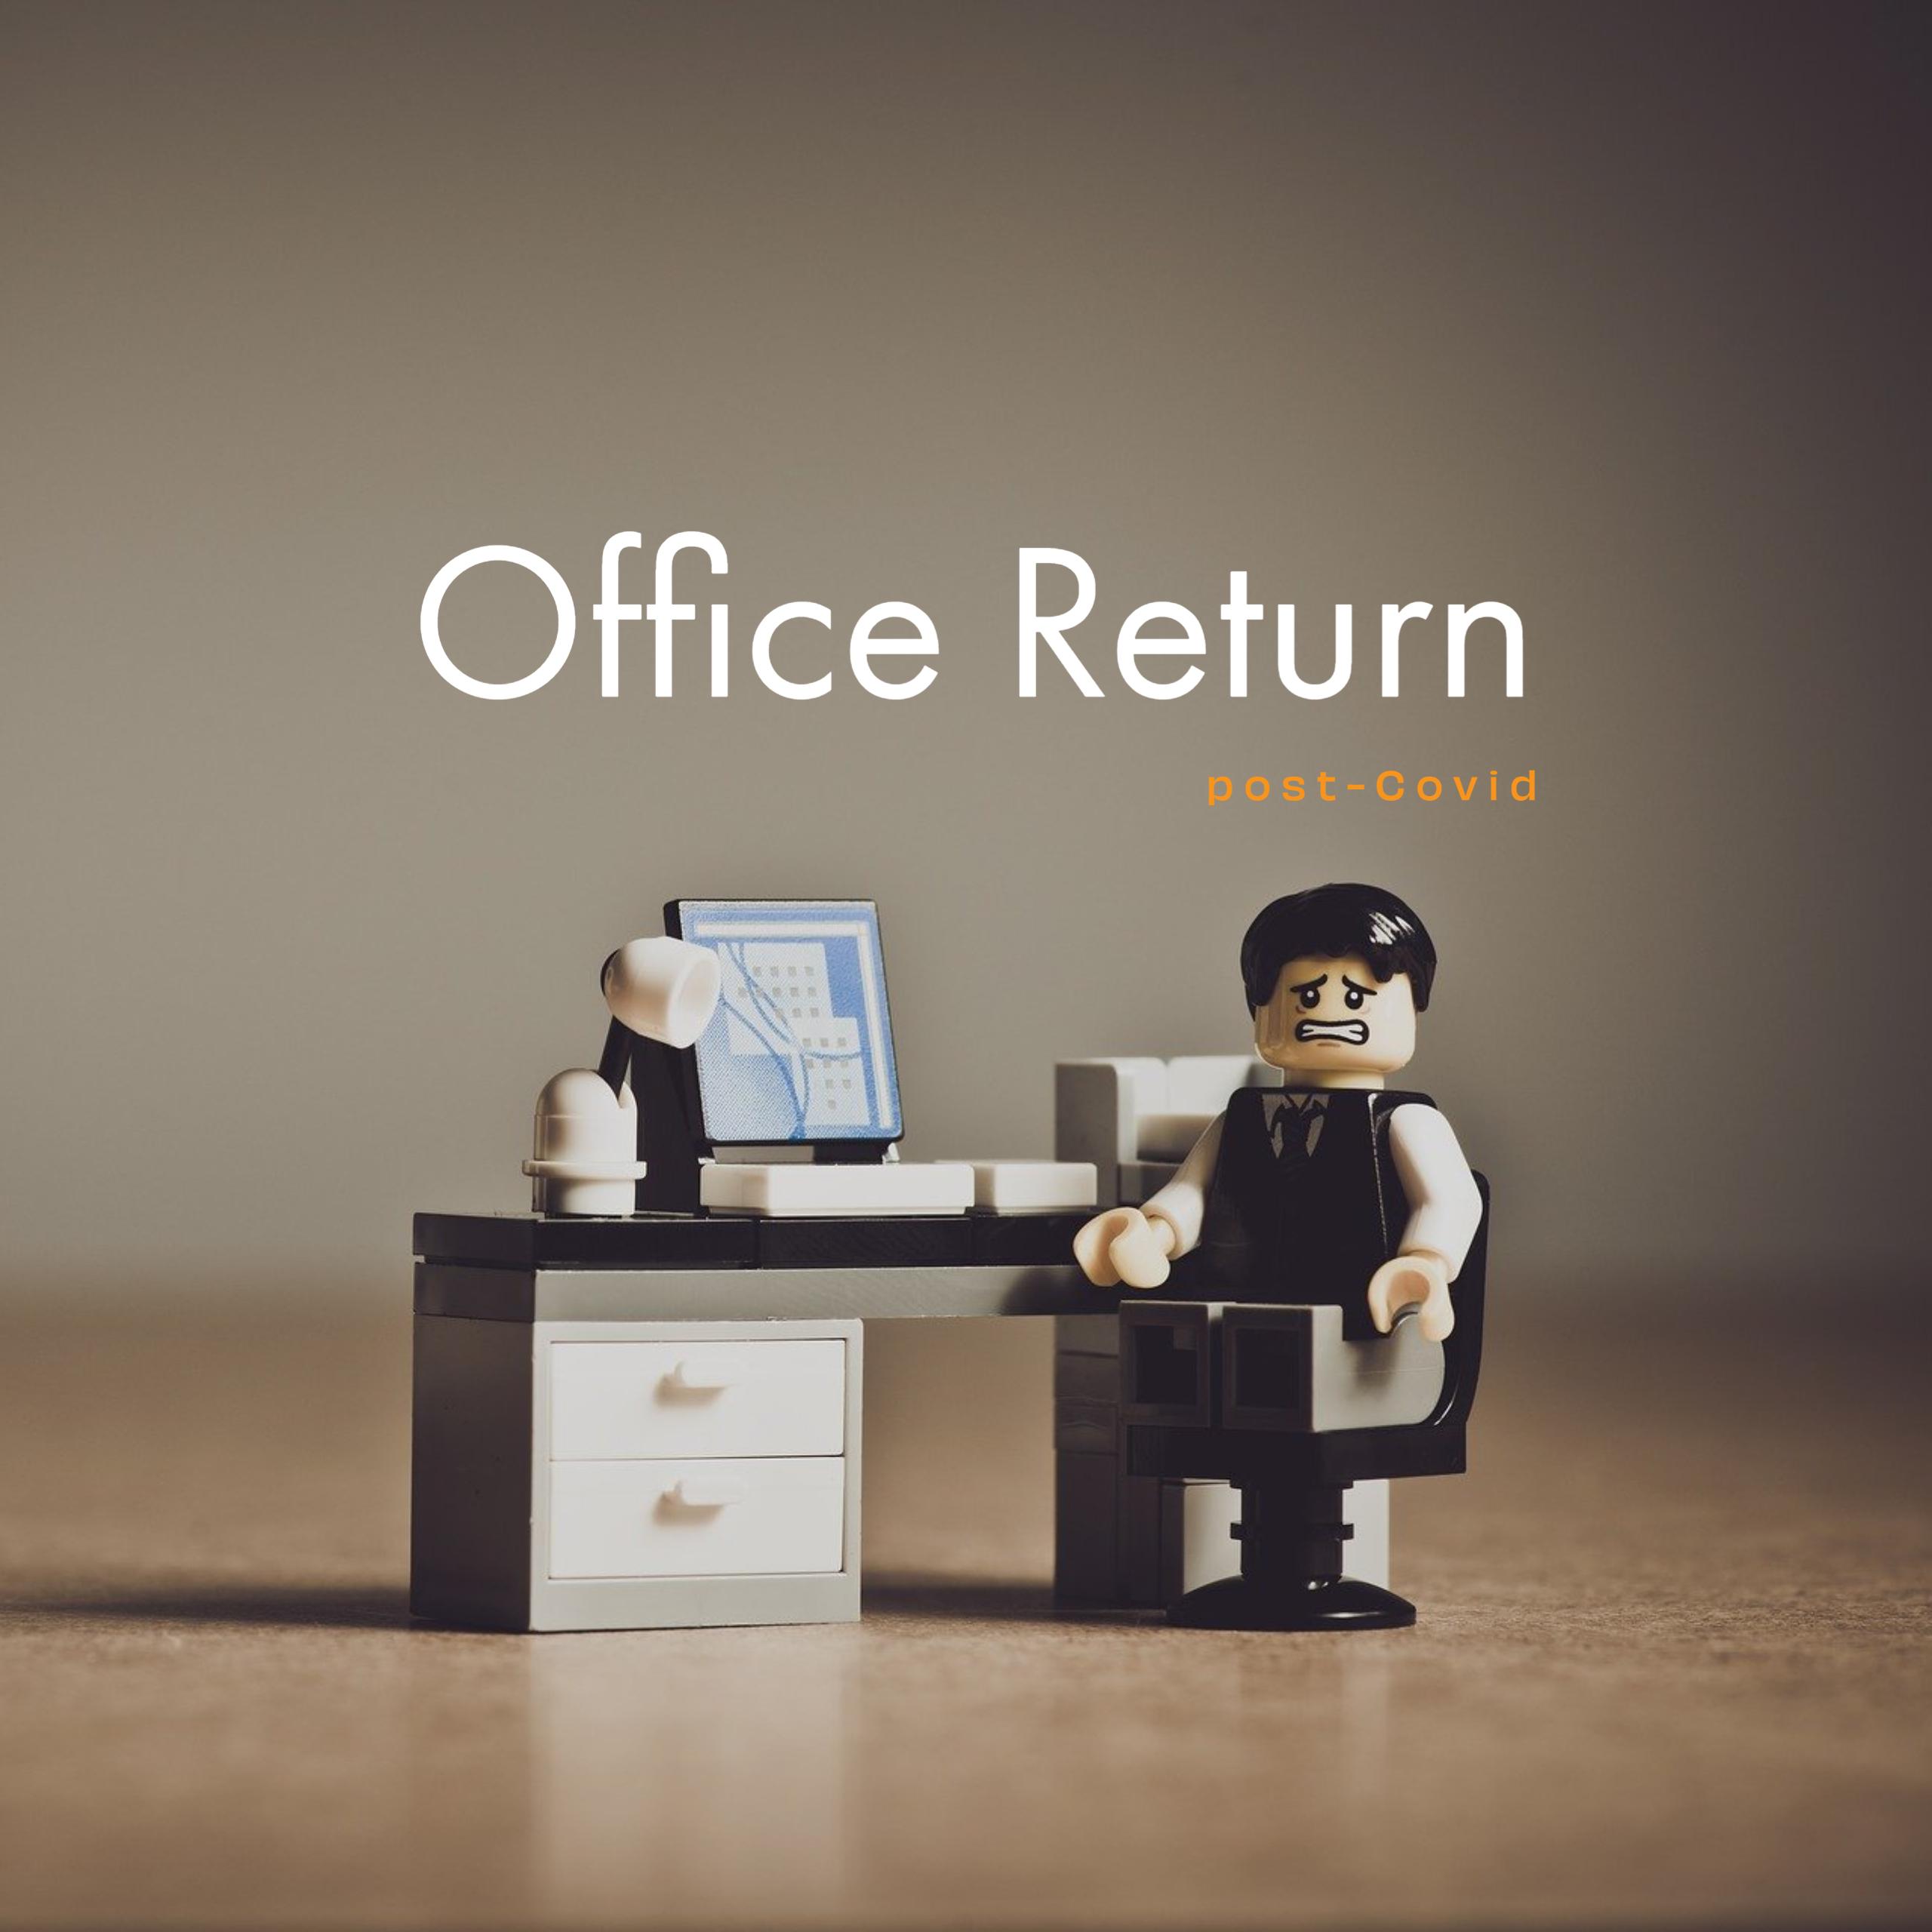 Office Return - Post Covid